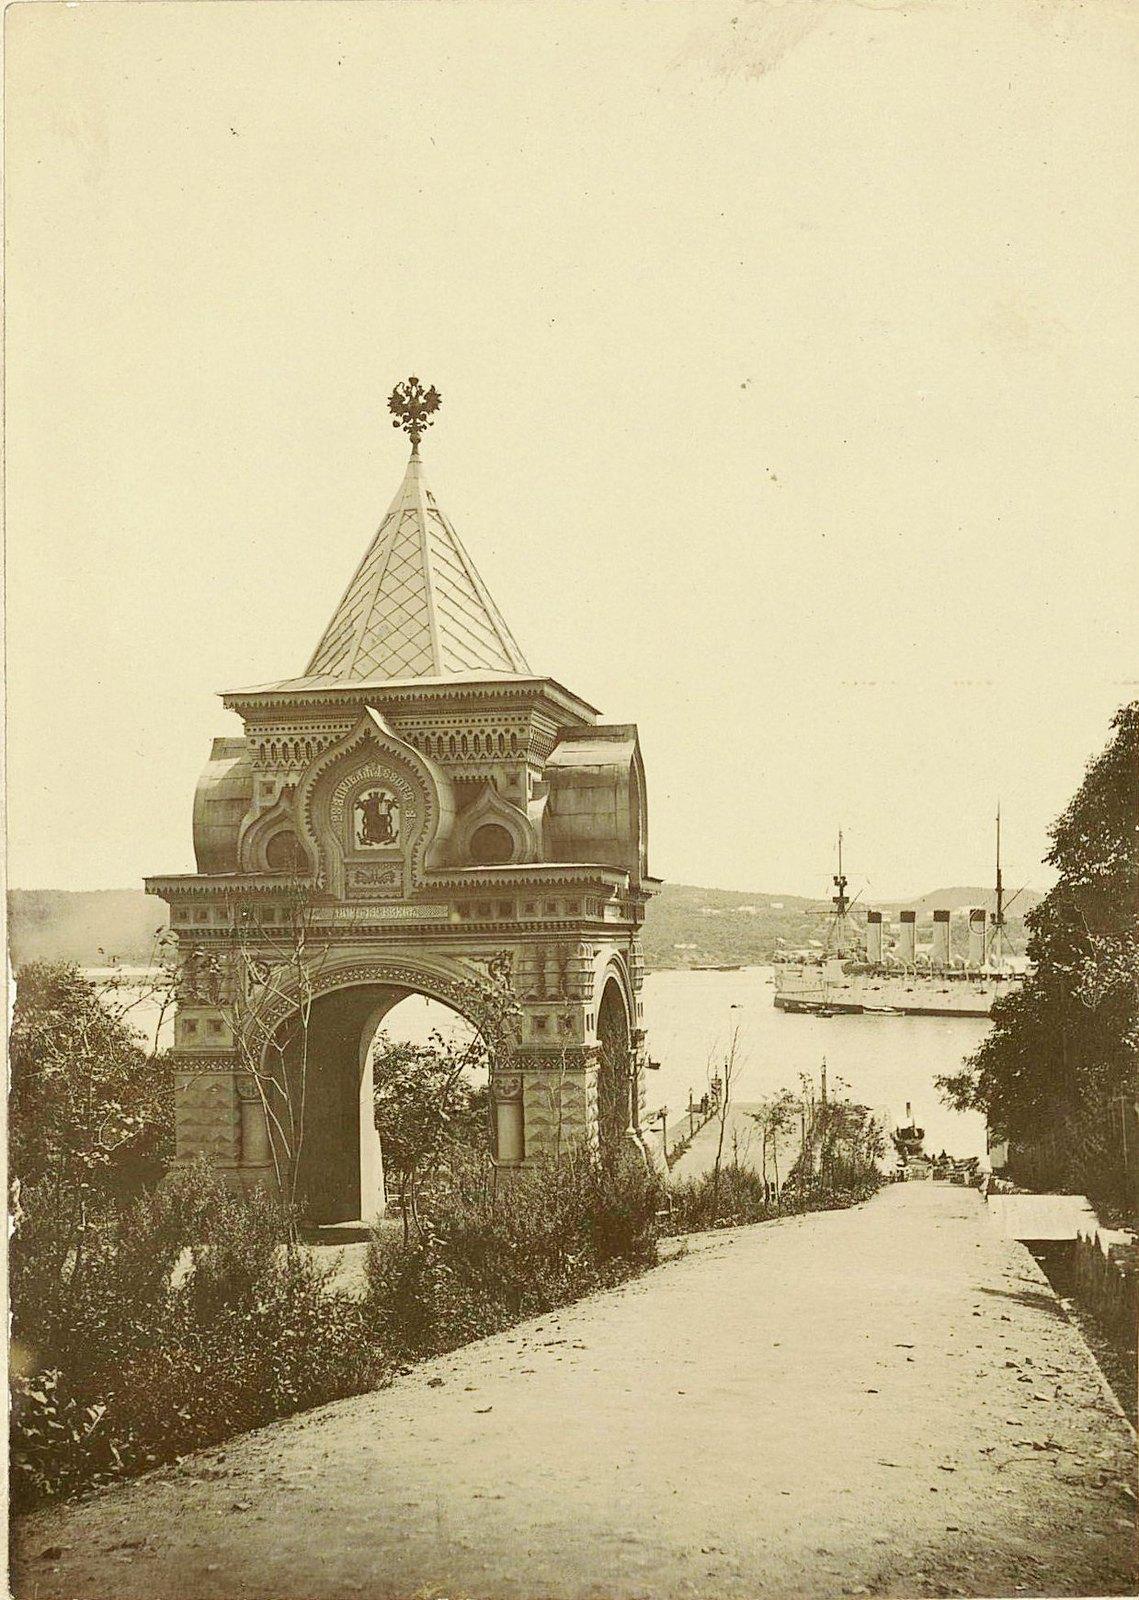 Владивосток. Триумфальная арка цесаревича Николая